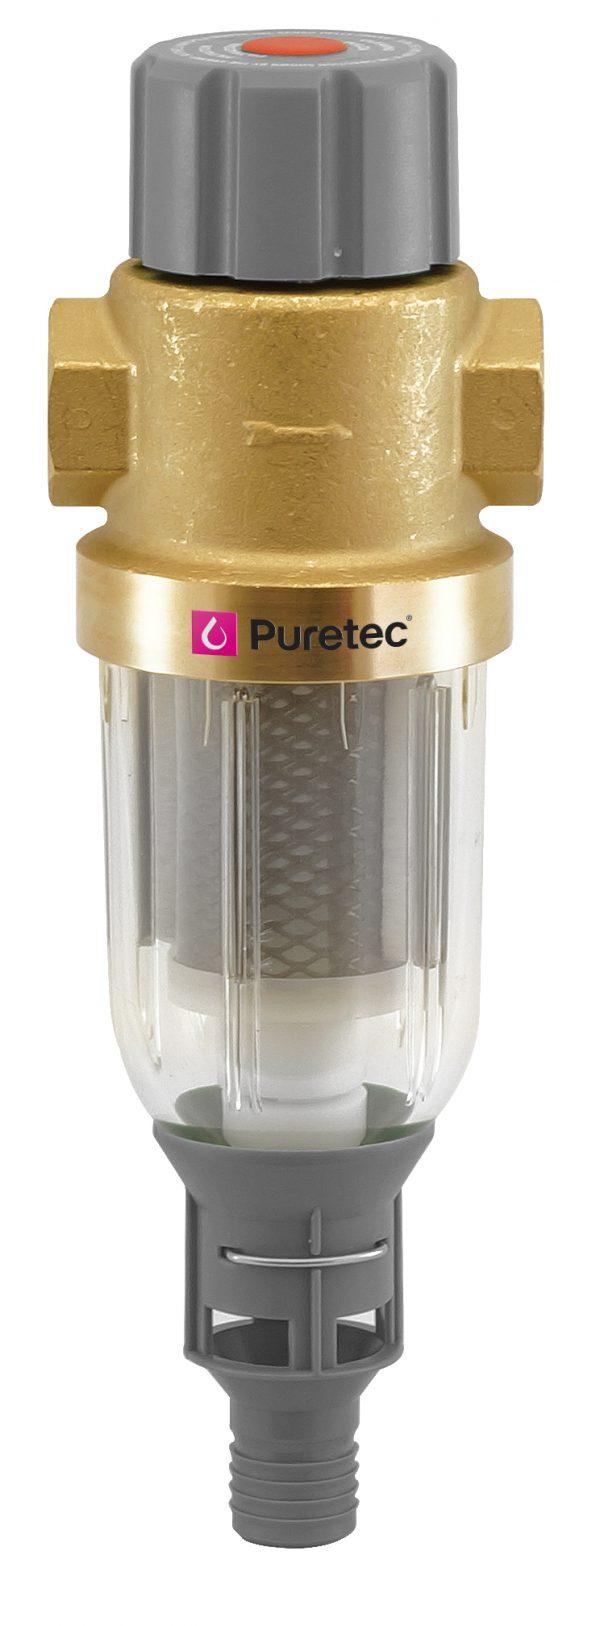 Puretec Manual Backwash Filter